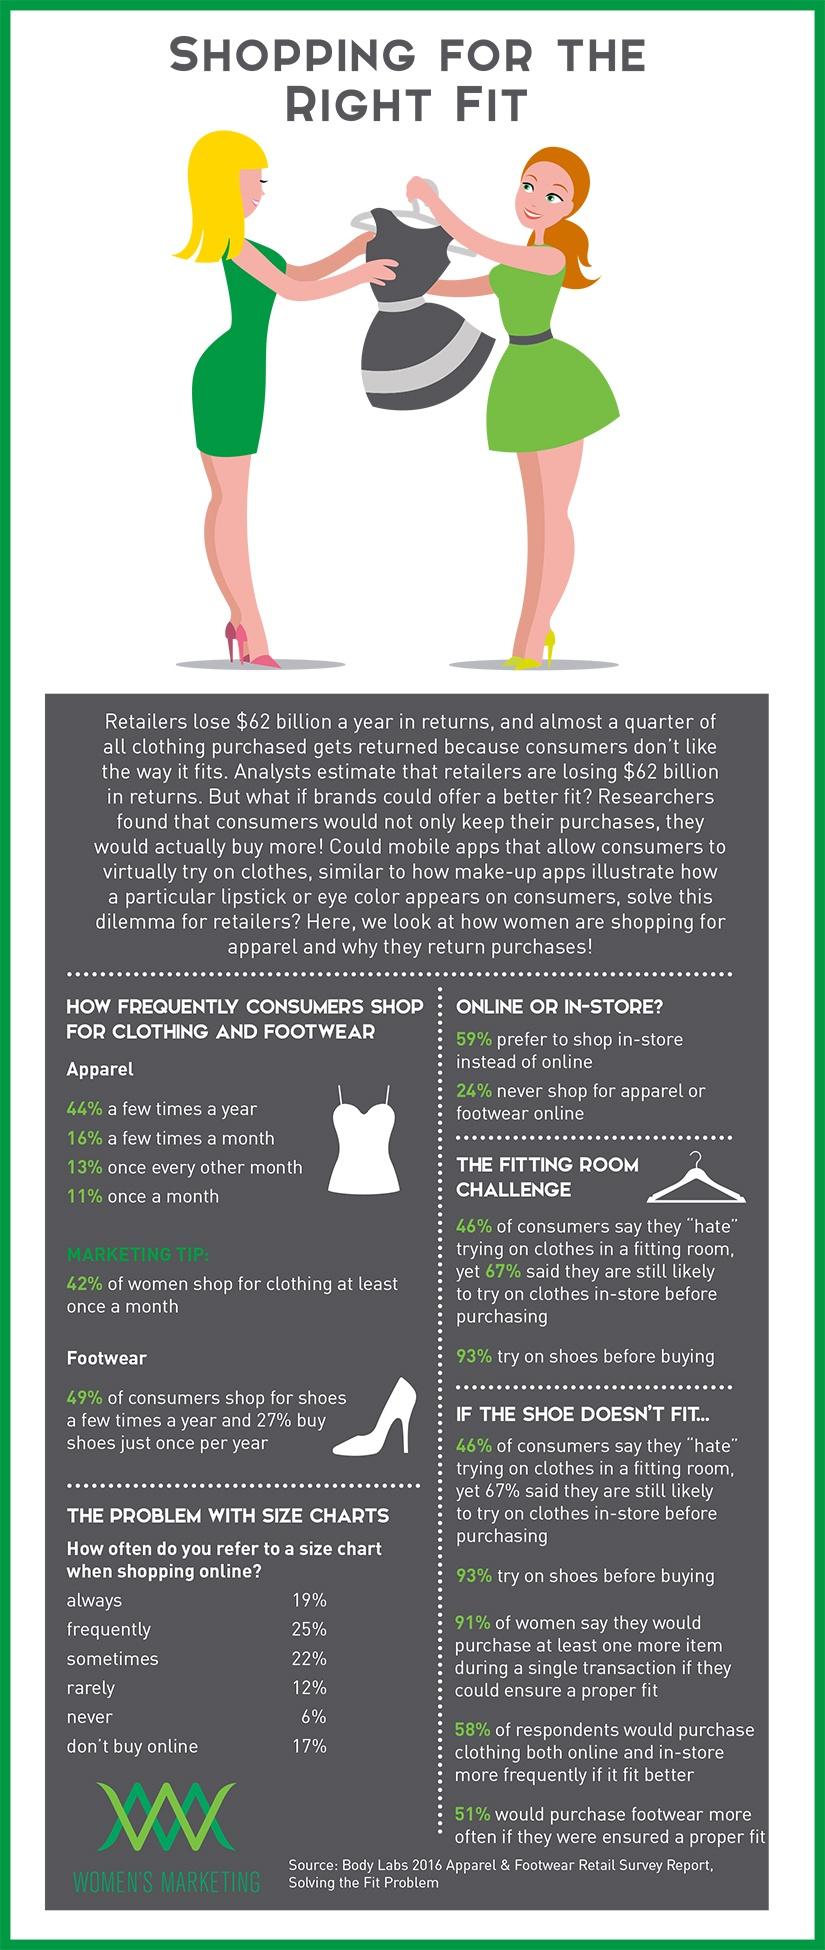 ShoppingfortheRightFit_Infographic.jpg